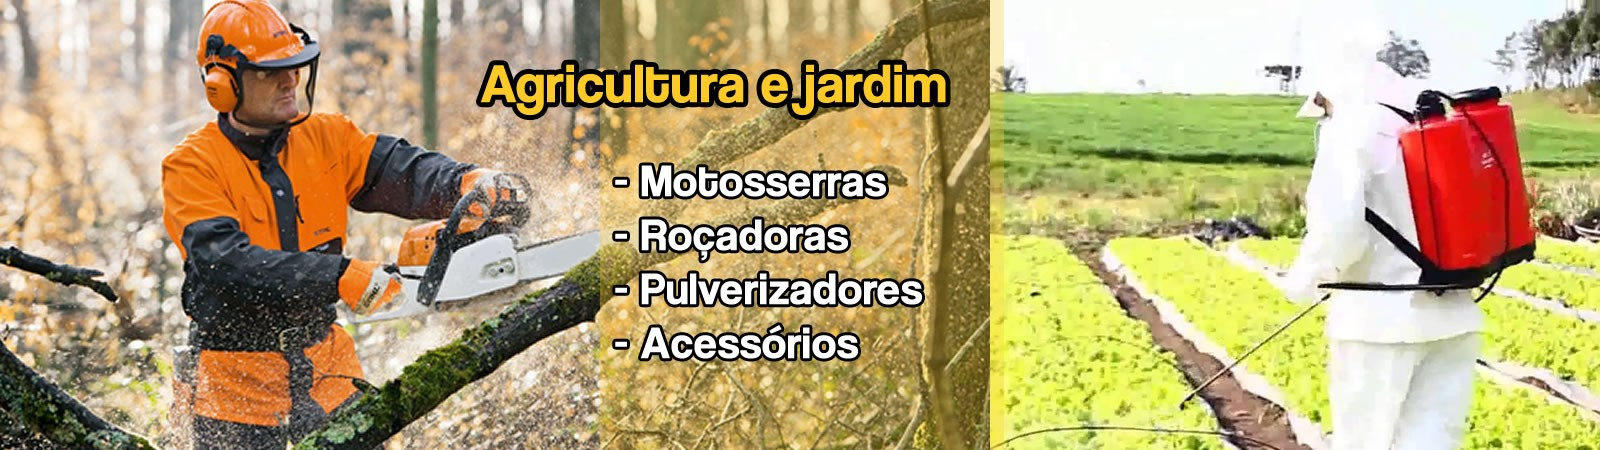 Agricultura e jardim